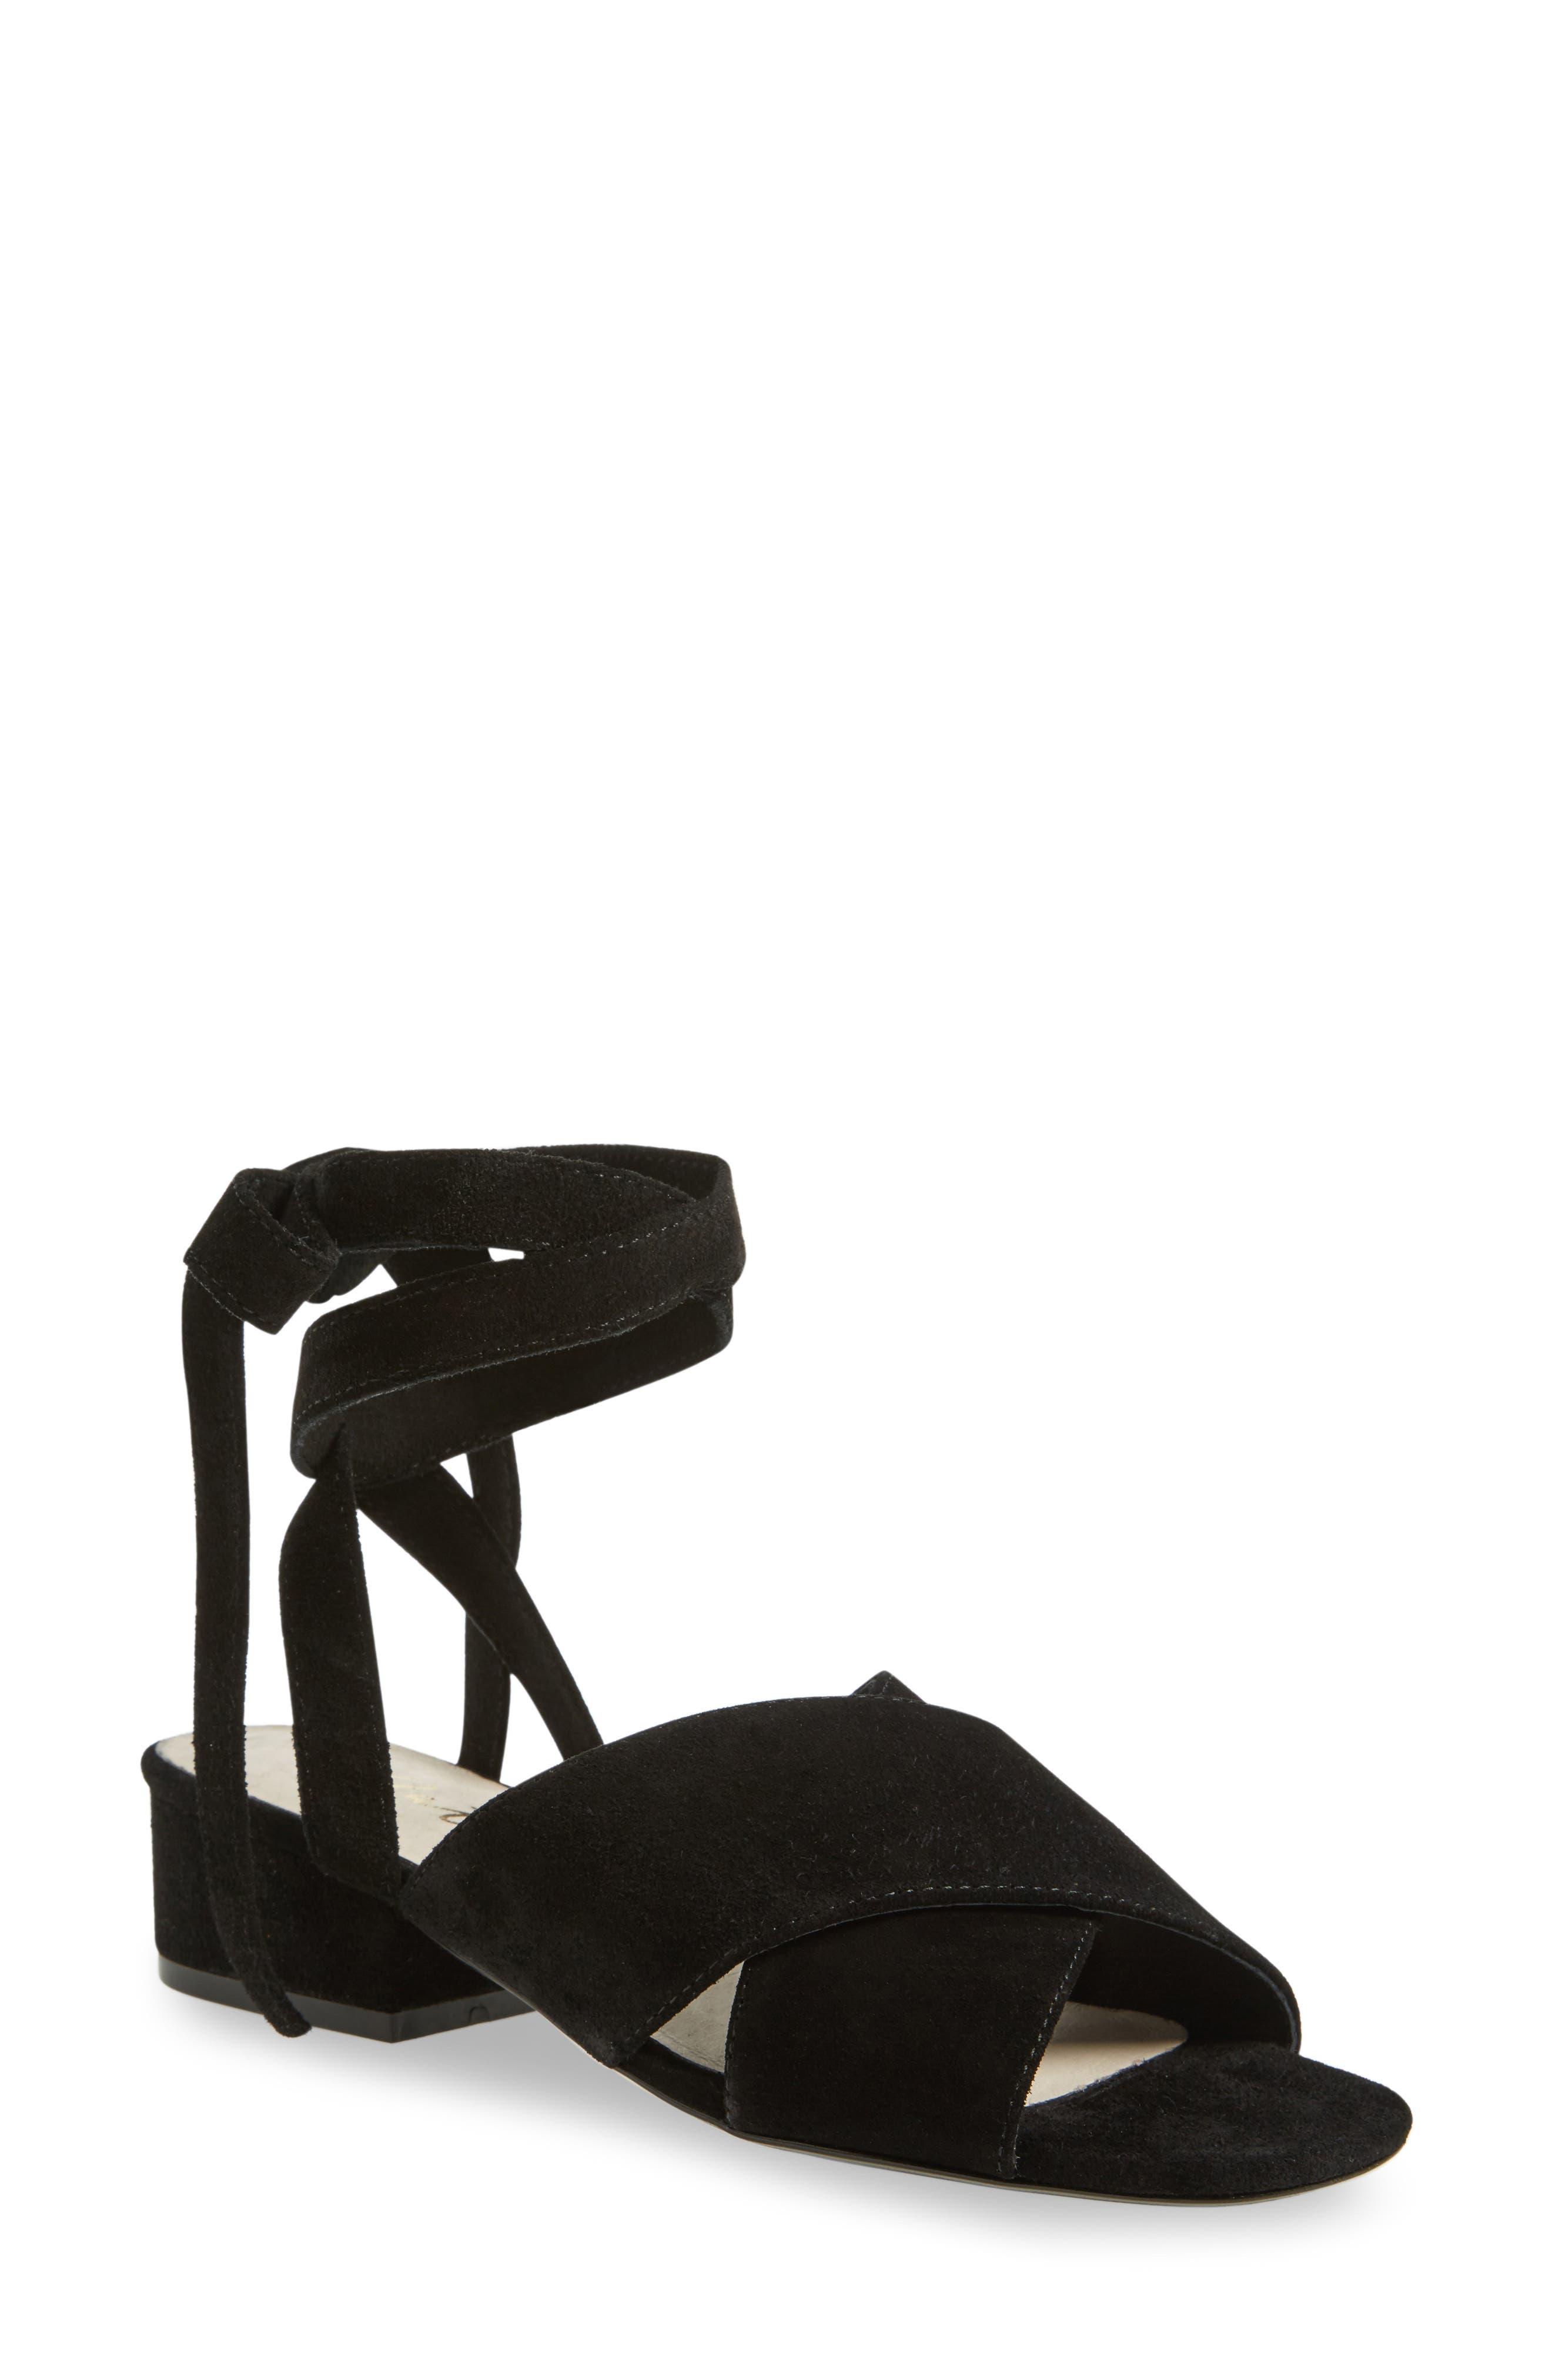 Frenzy Sandal,                         Main,                         color, Black Suede